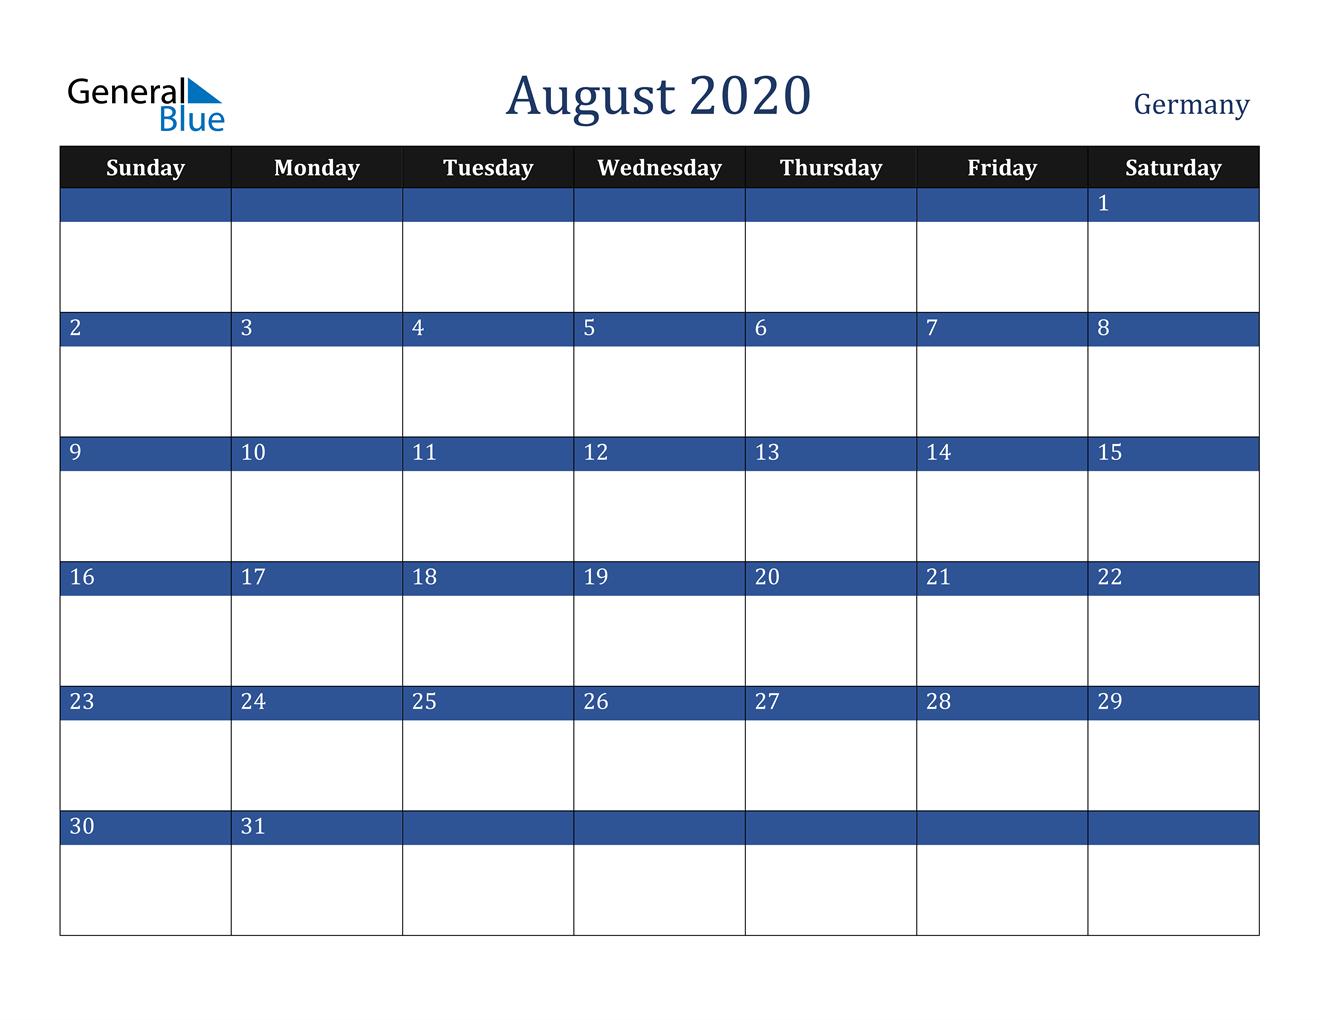 August 2020 Calendar - Germany